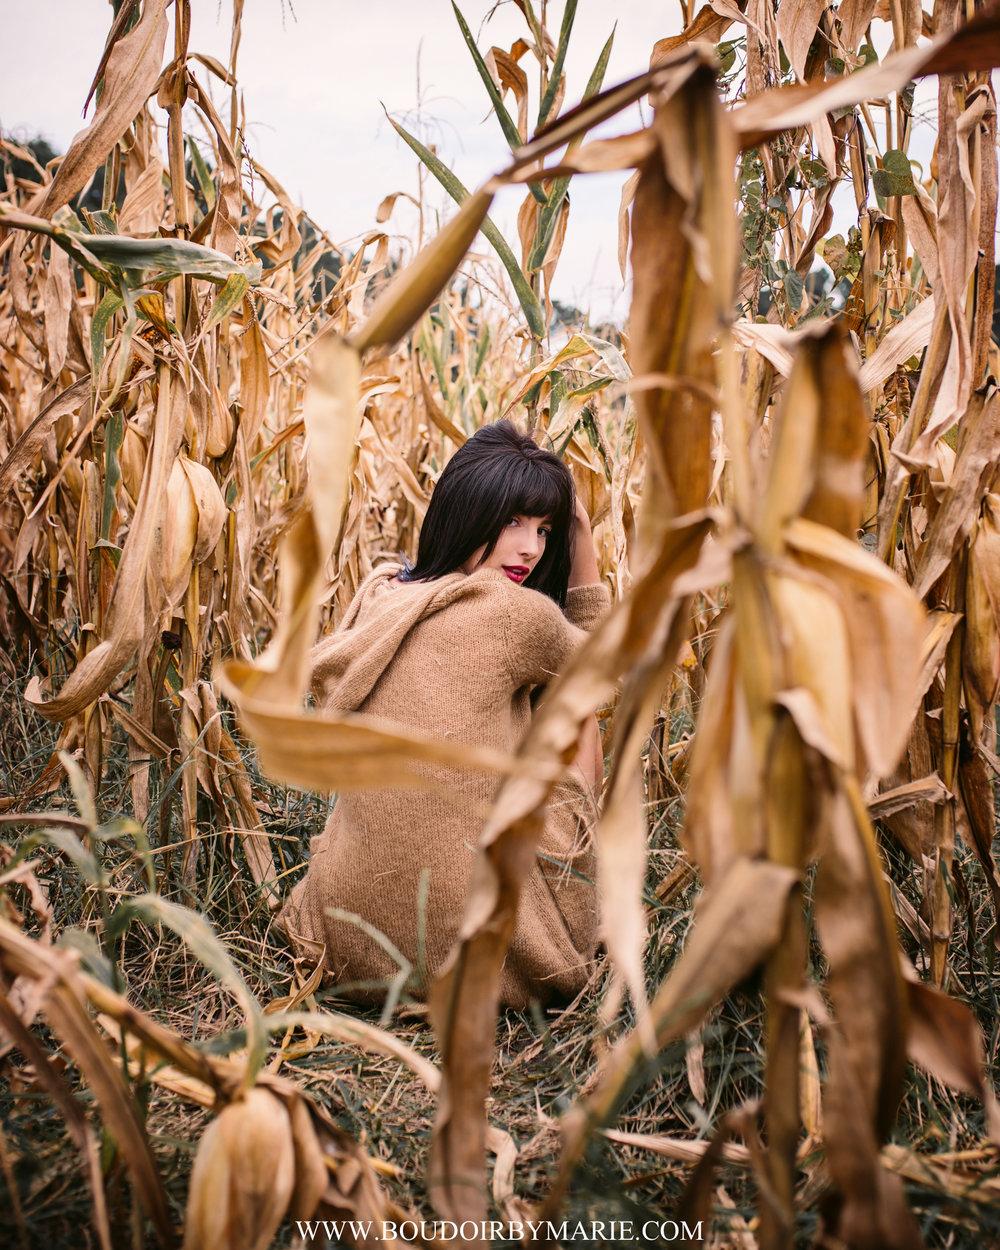 BoudoirbyMarie-AutumnBoudoir-13.jpg